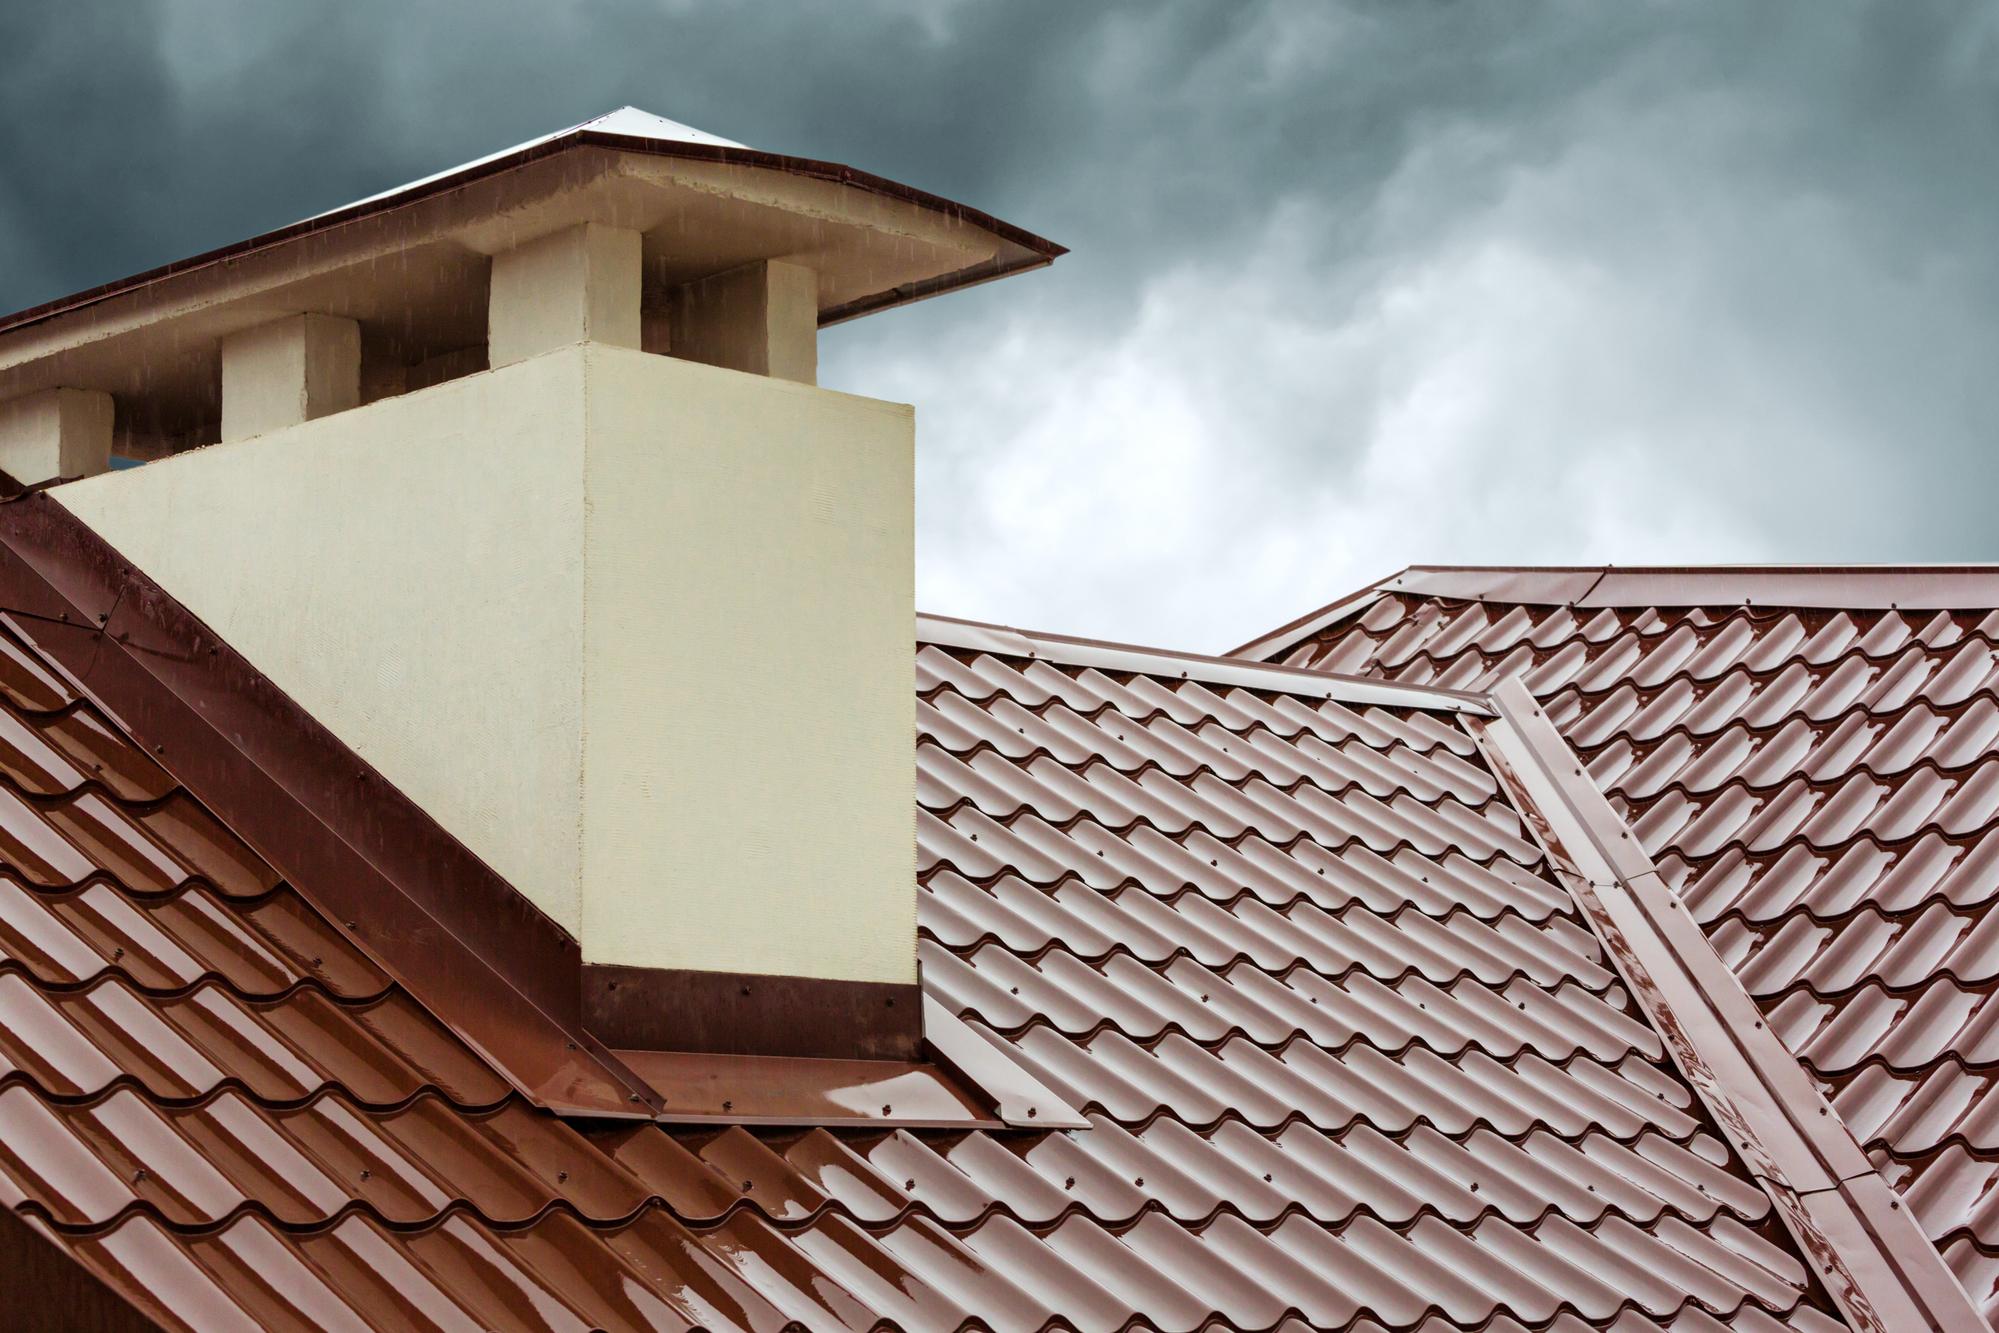 Rain over roof